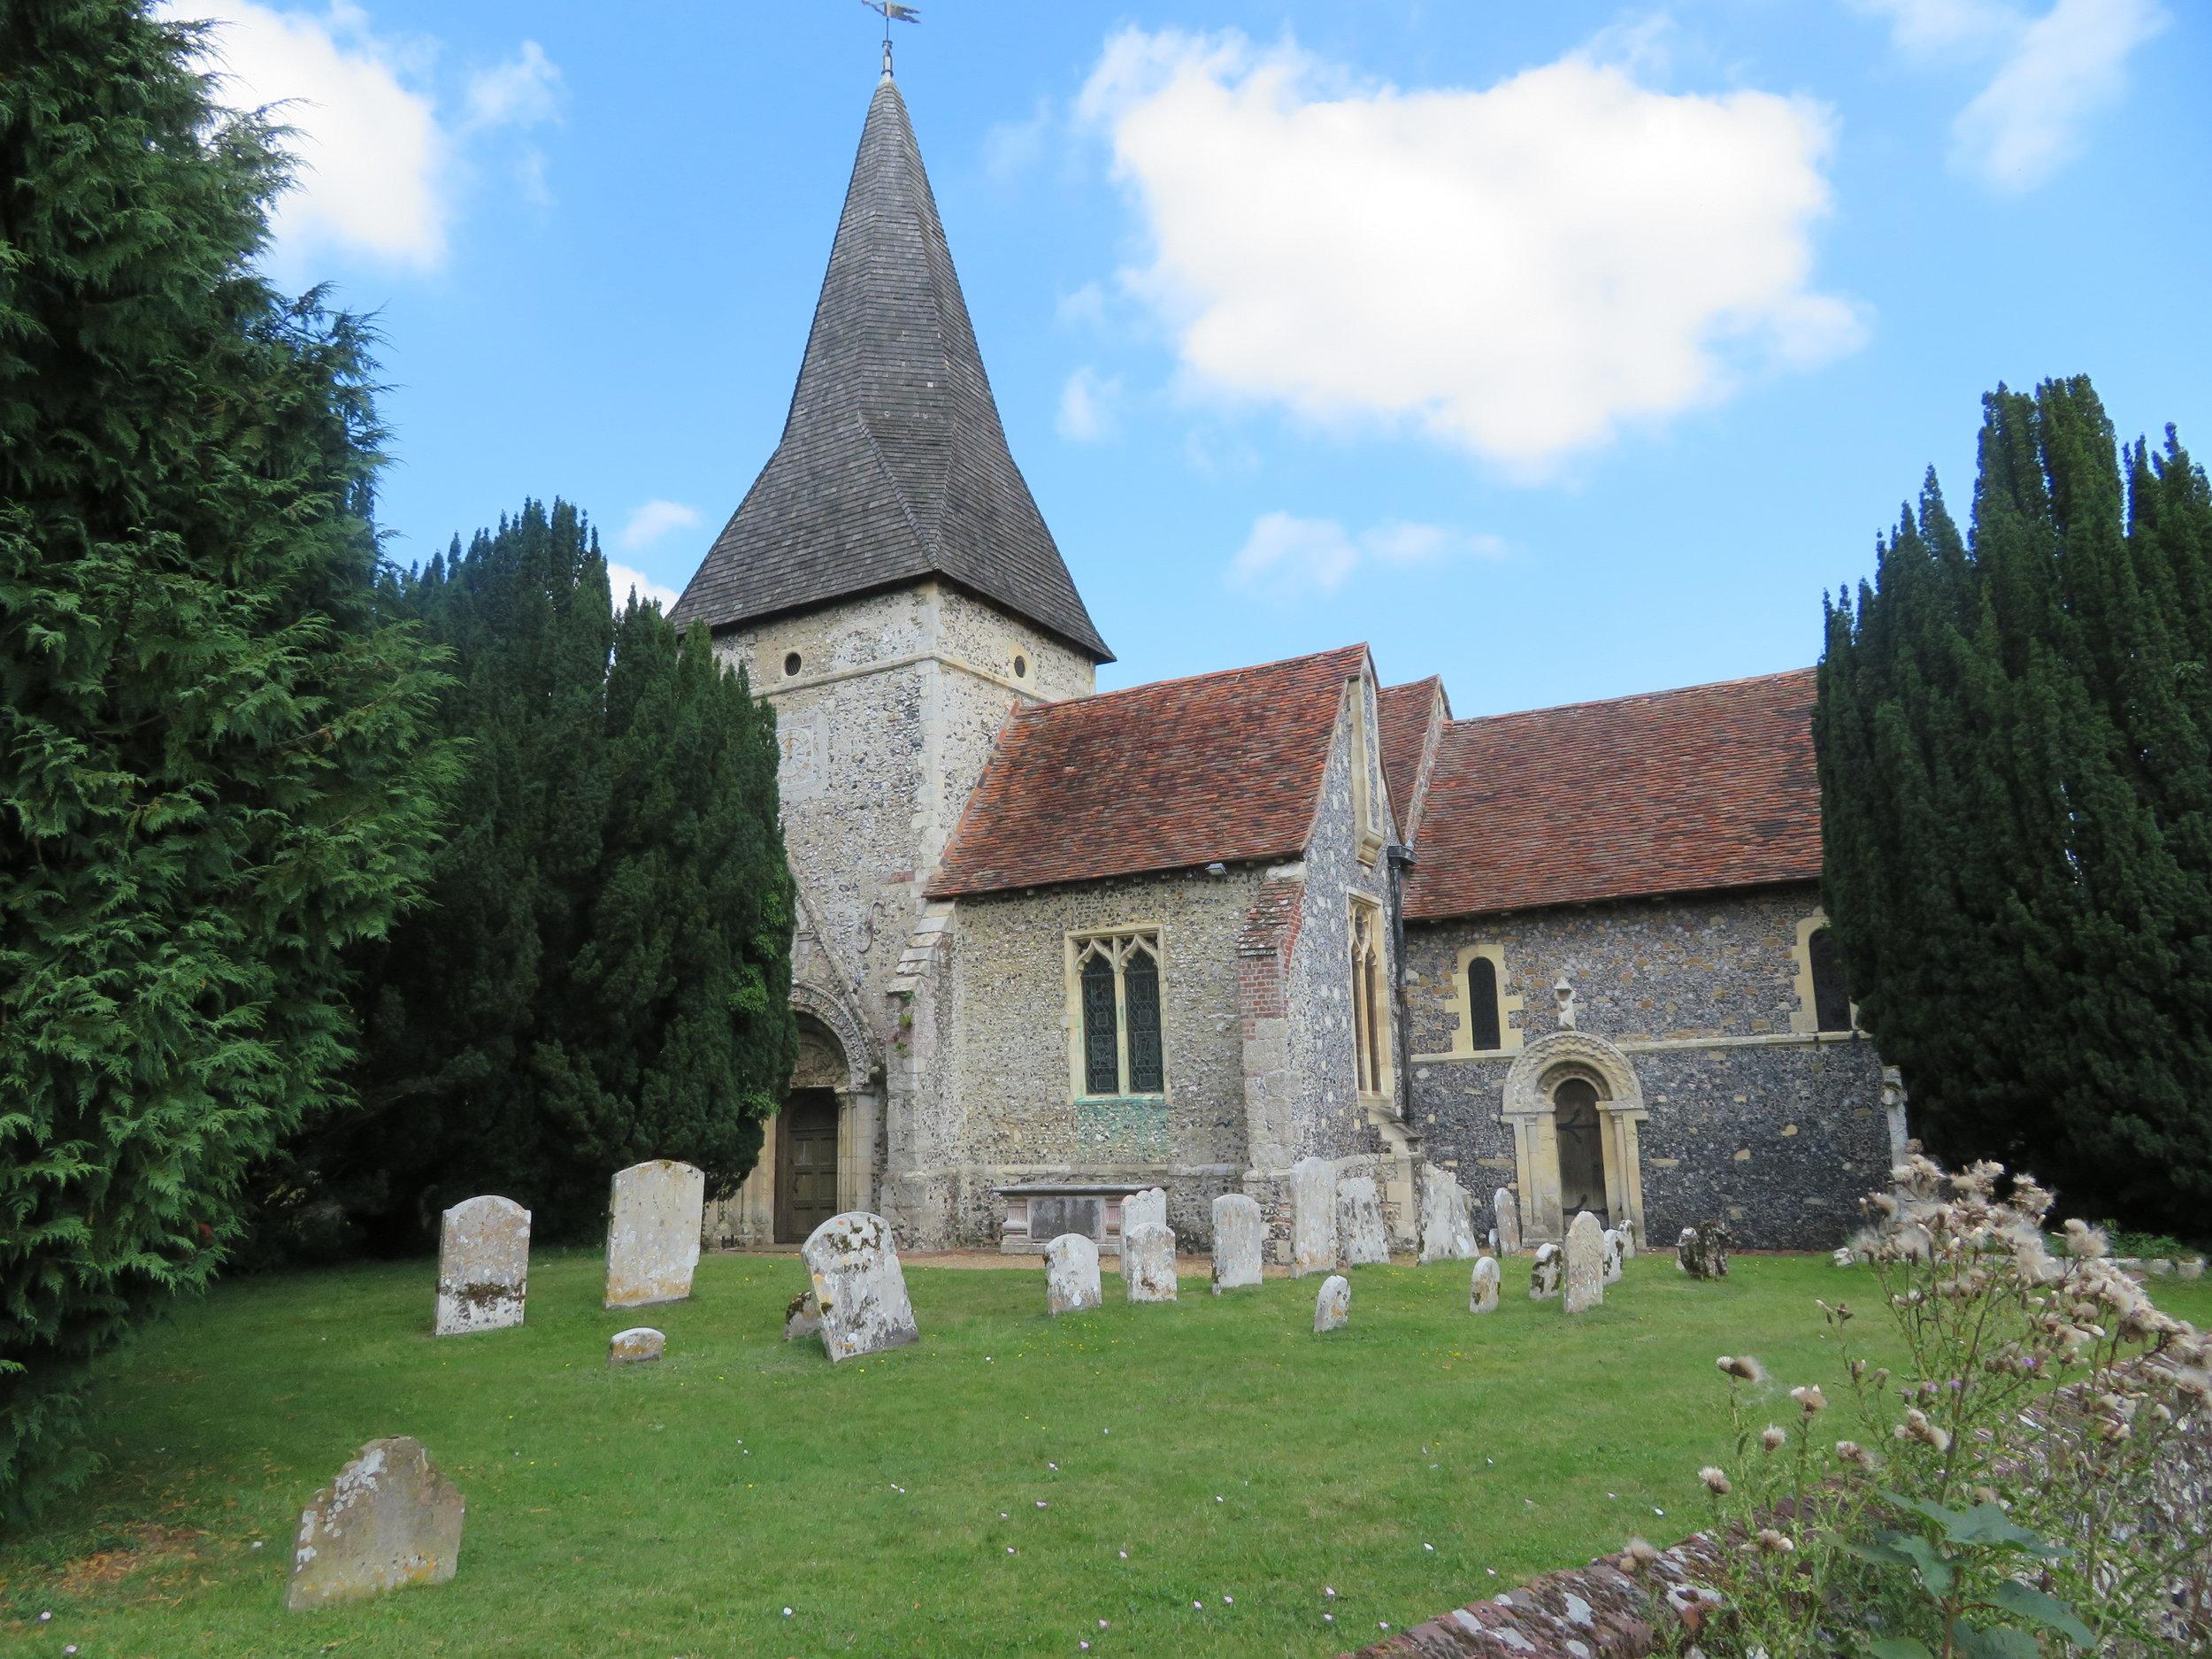 St Mary's Church, Patrixbourne